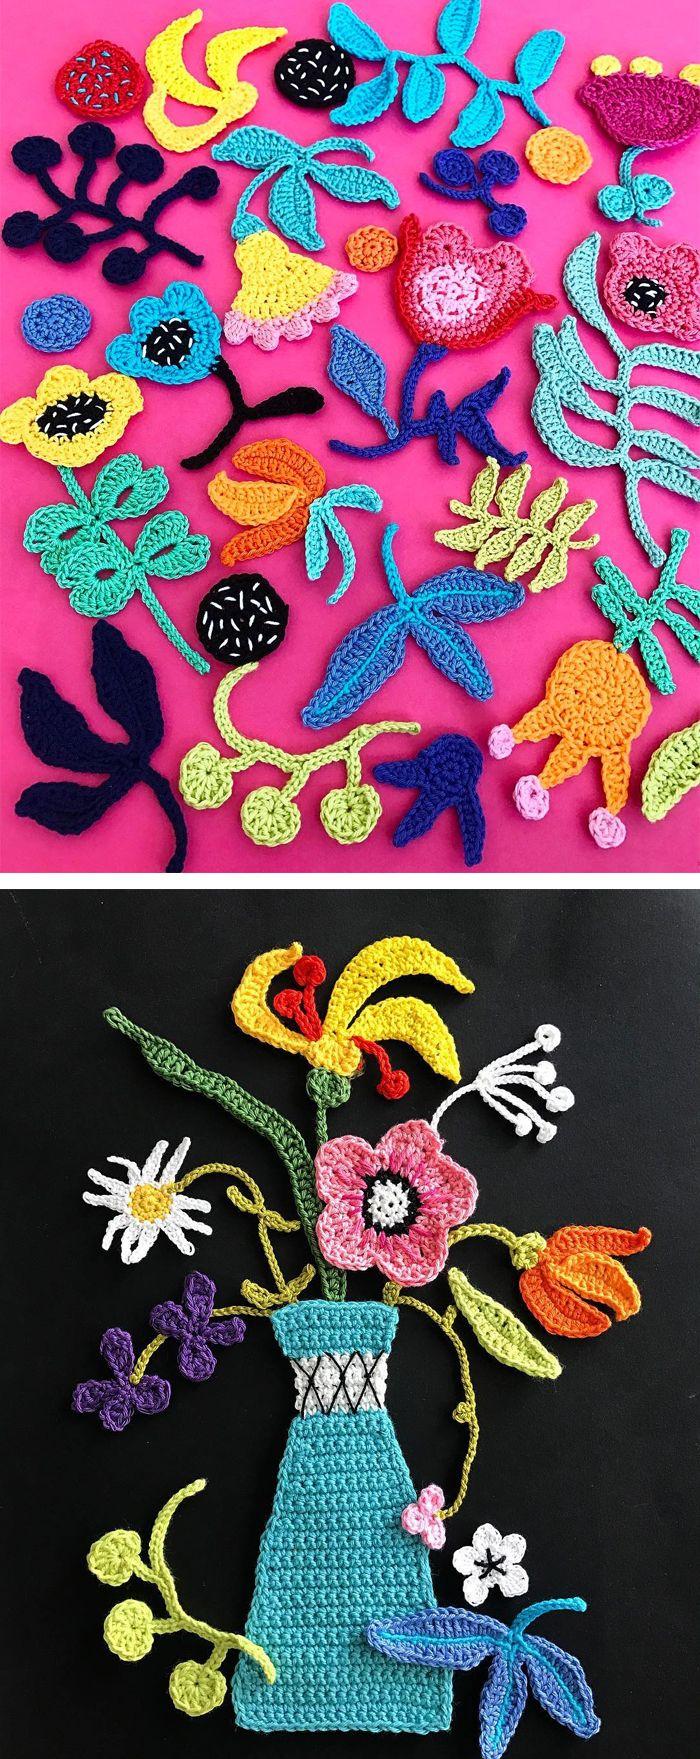 Crochet art by Tuija Heikkinen #crochet #fiber art #embroidery ...